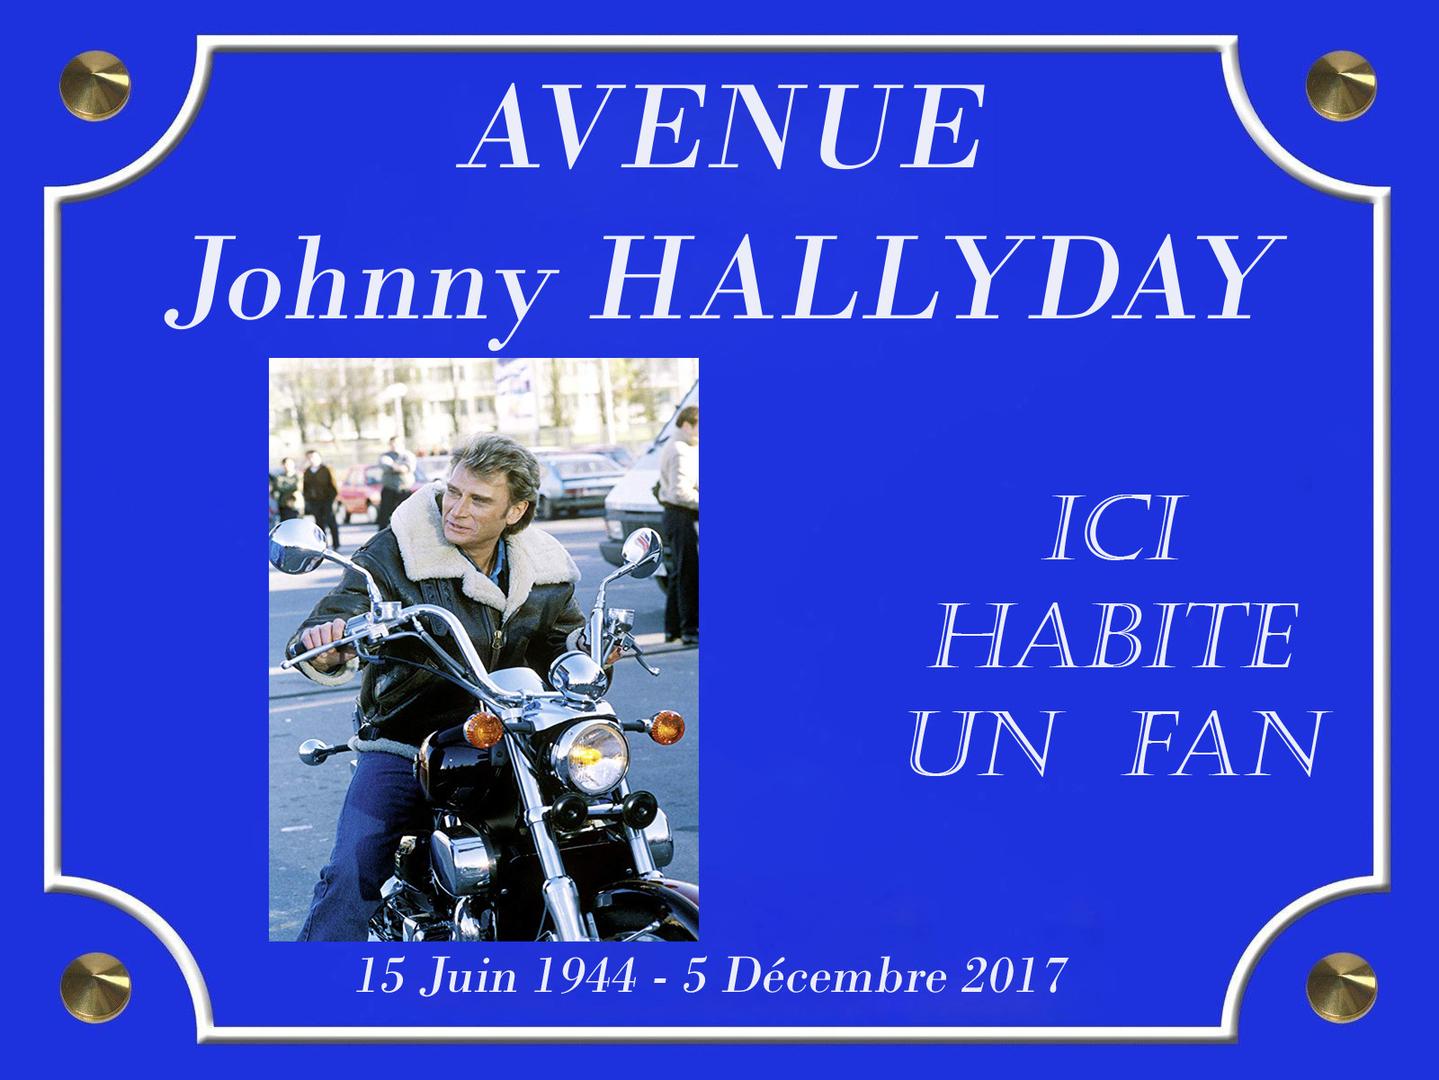 AVENUE Johnny HALLYDAY DAVID LANSKY